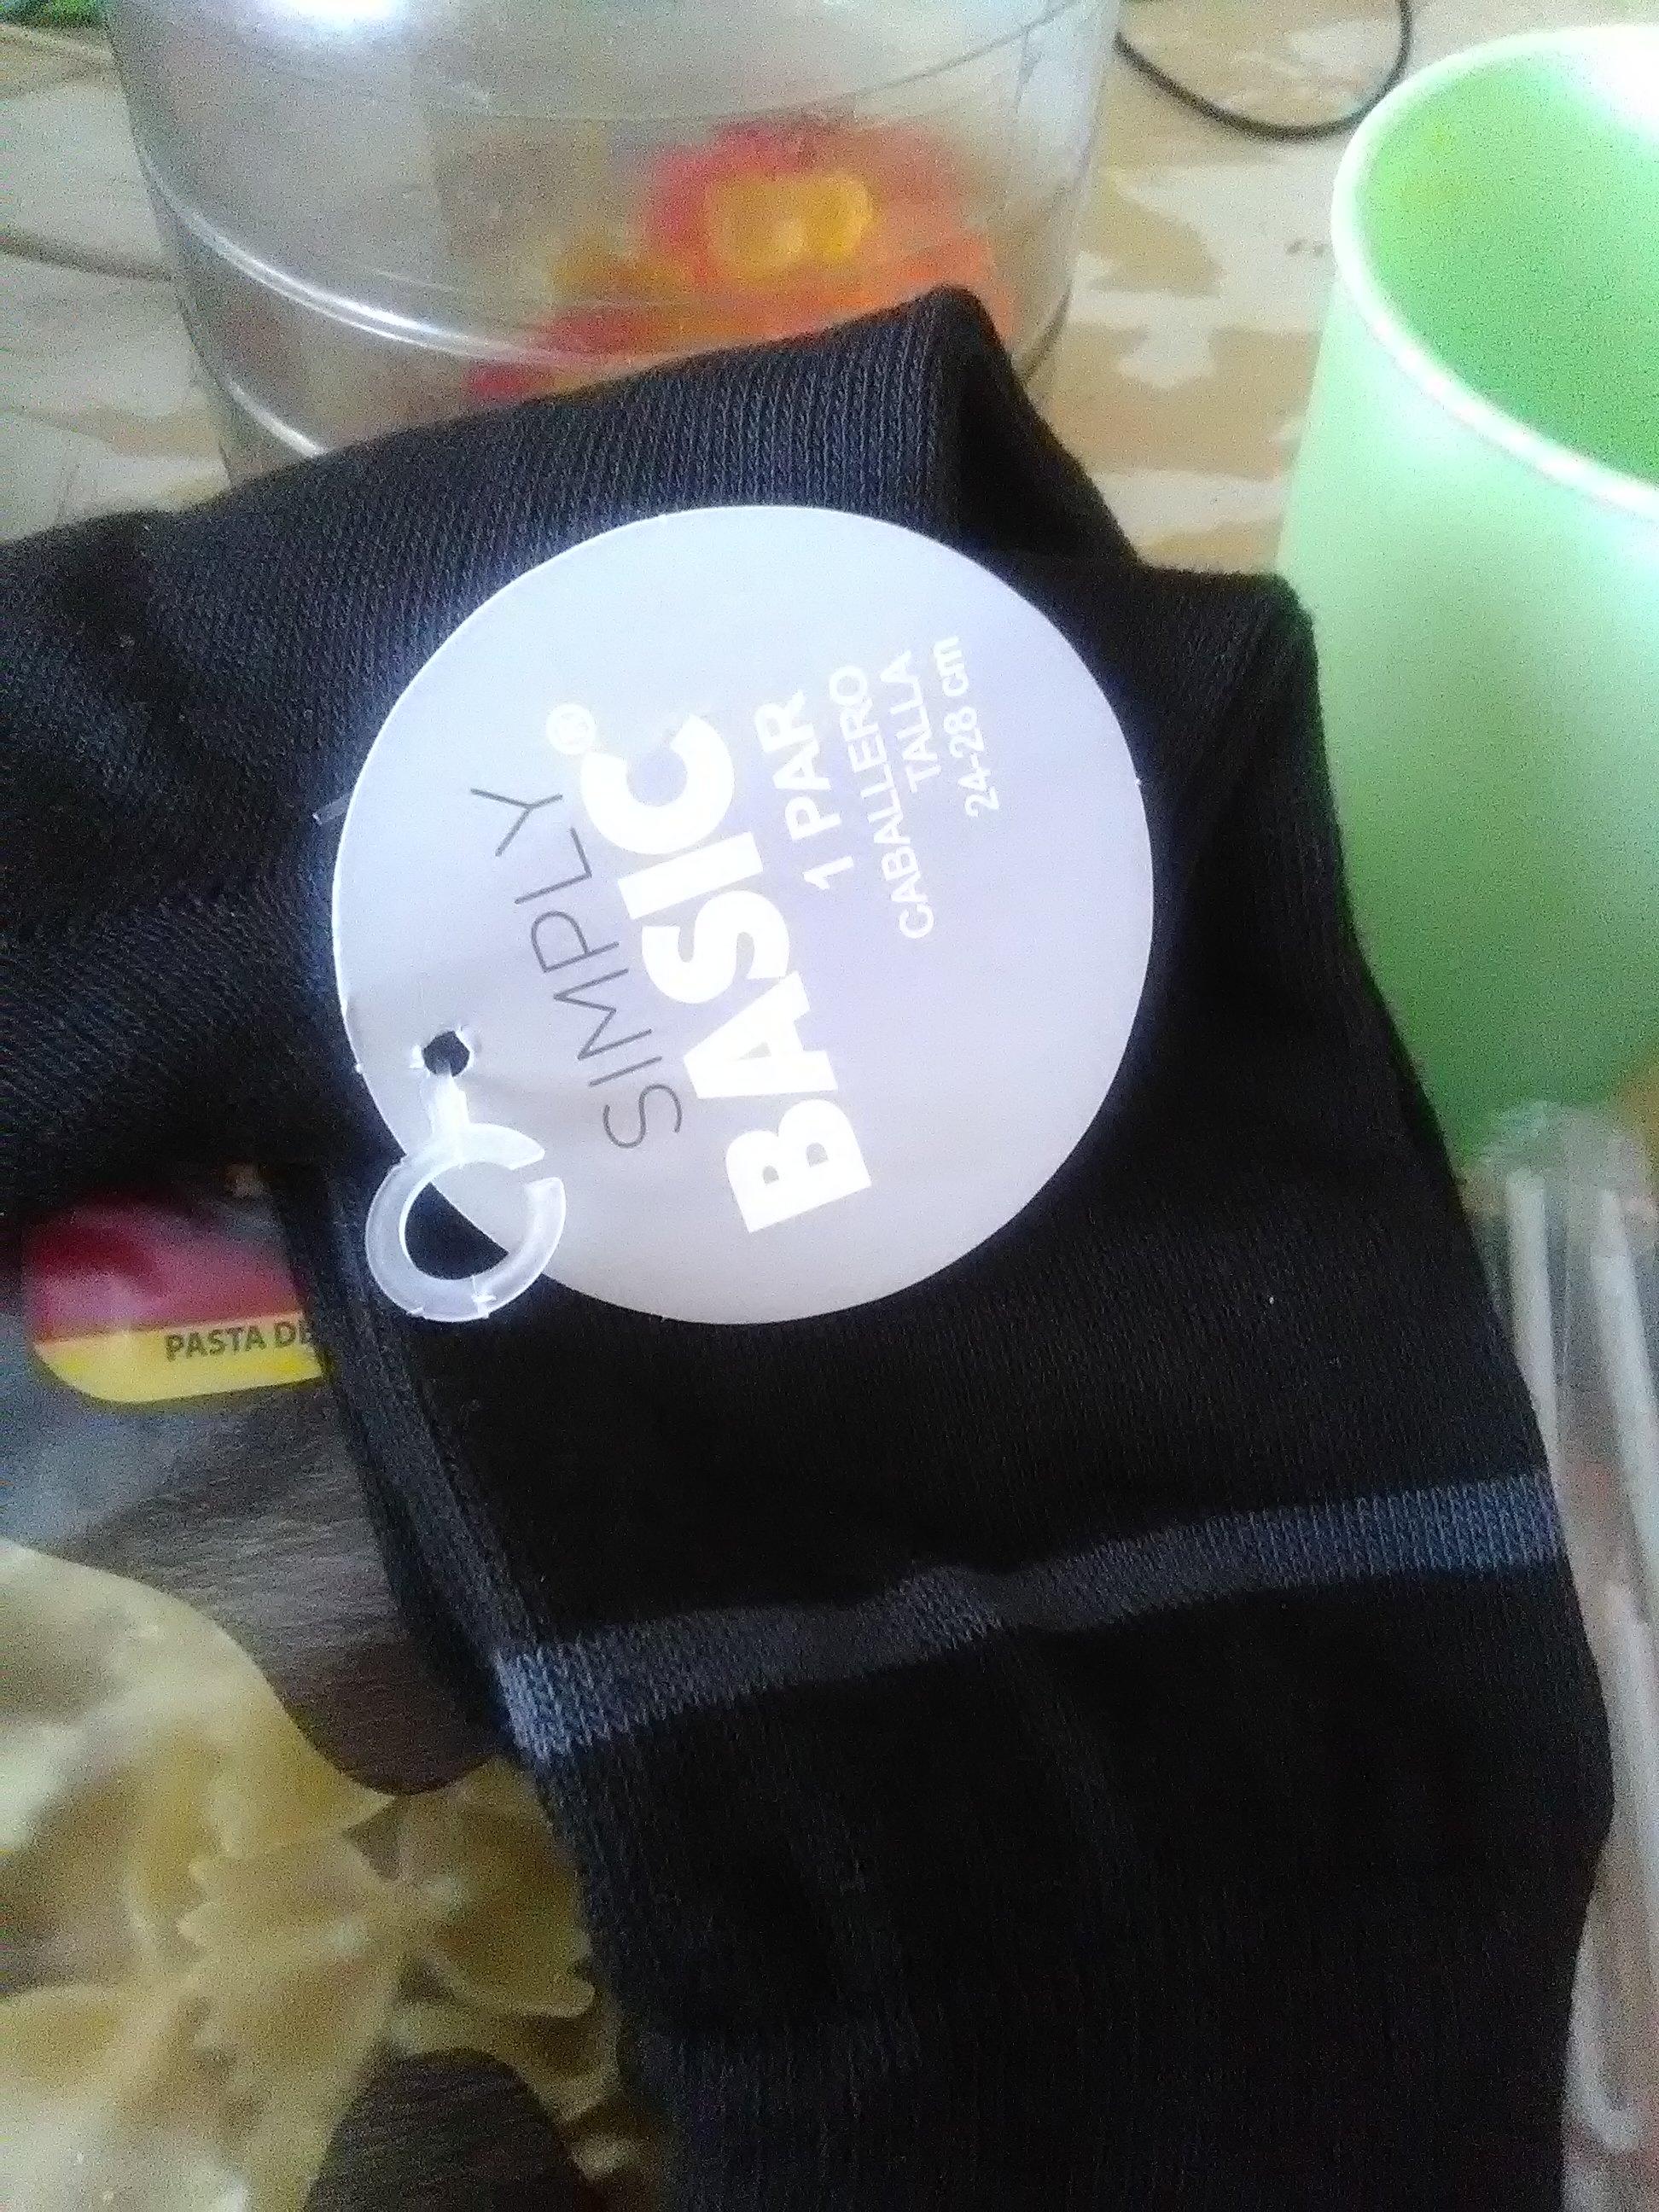 Bodega Aurrerá: calcetín a 7 y mas